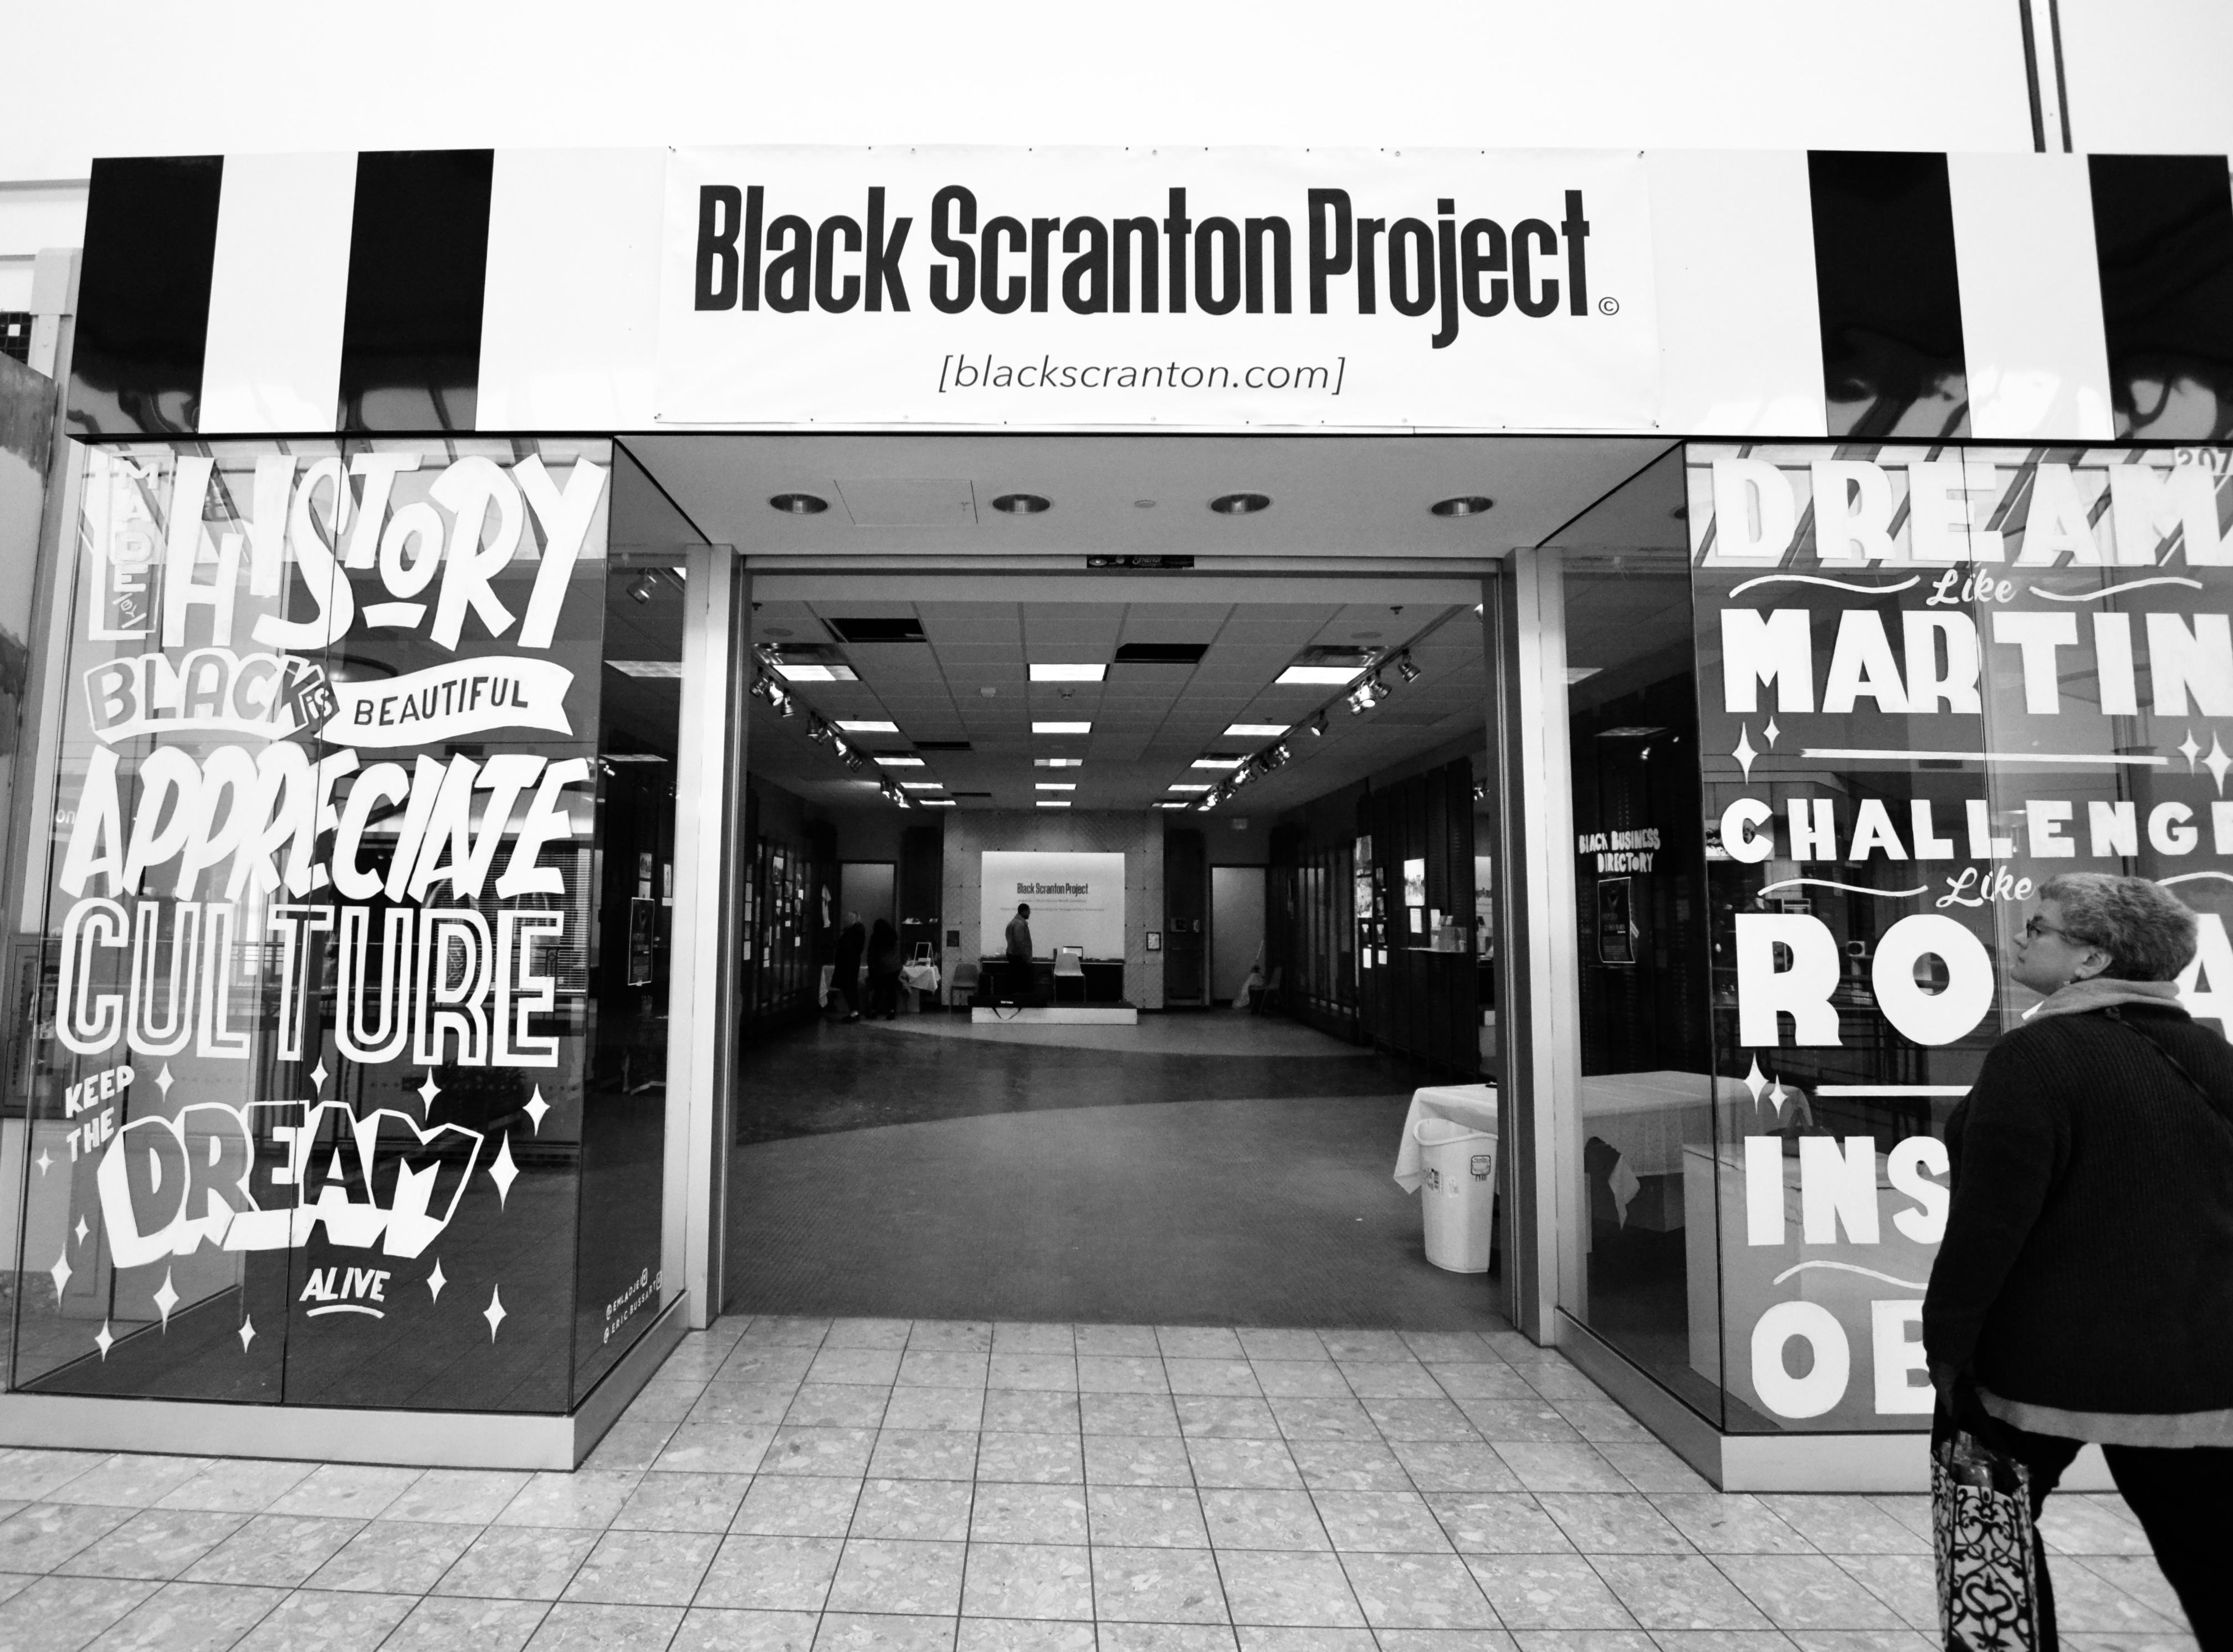 Black Scranton Project's Pop-Up Gallery